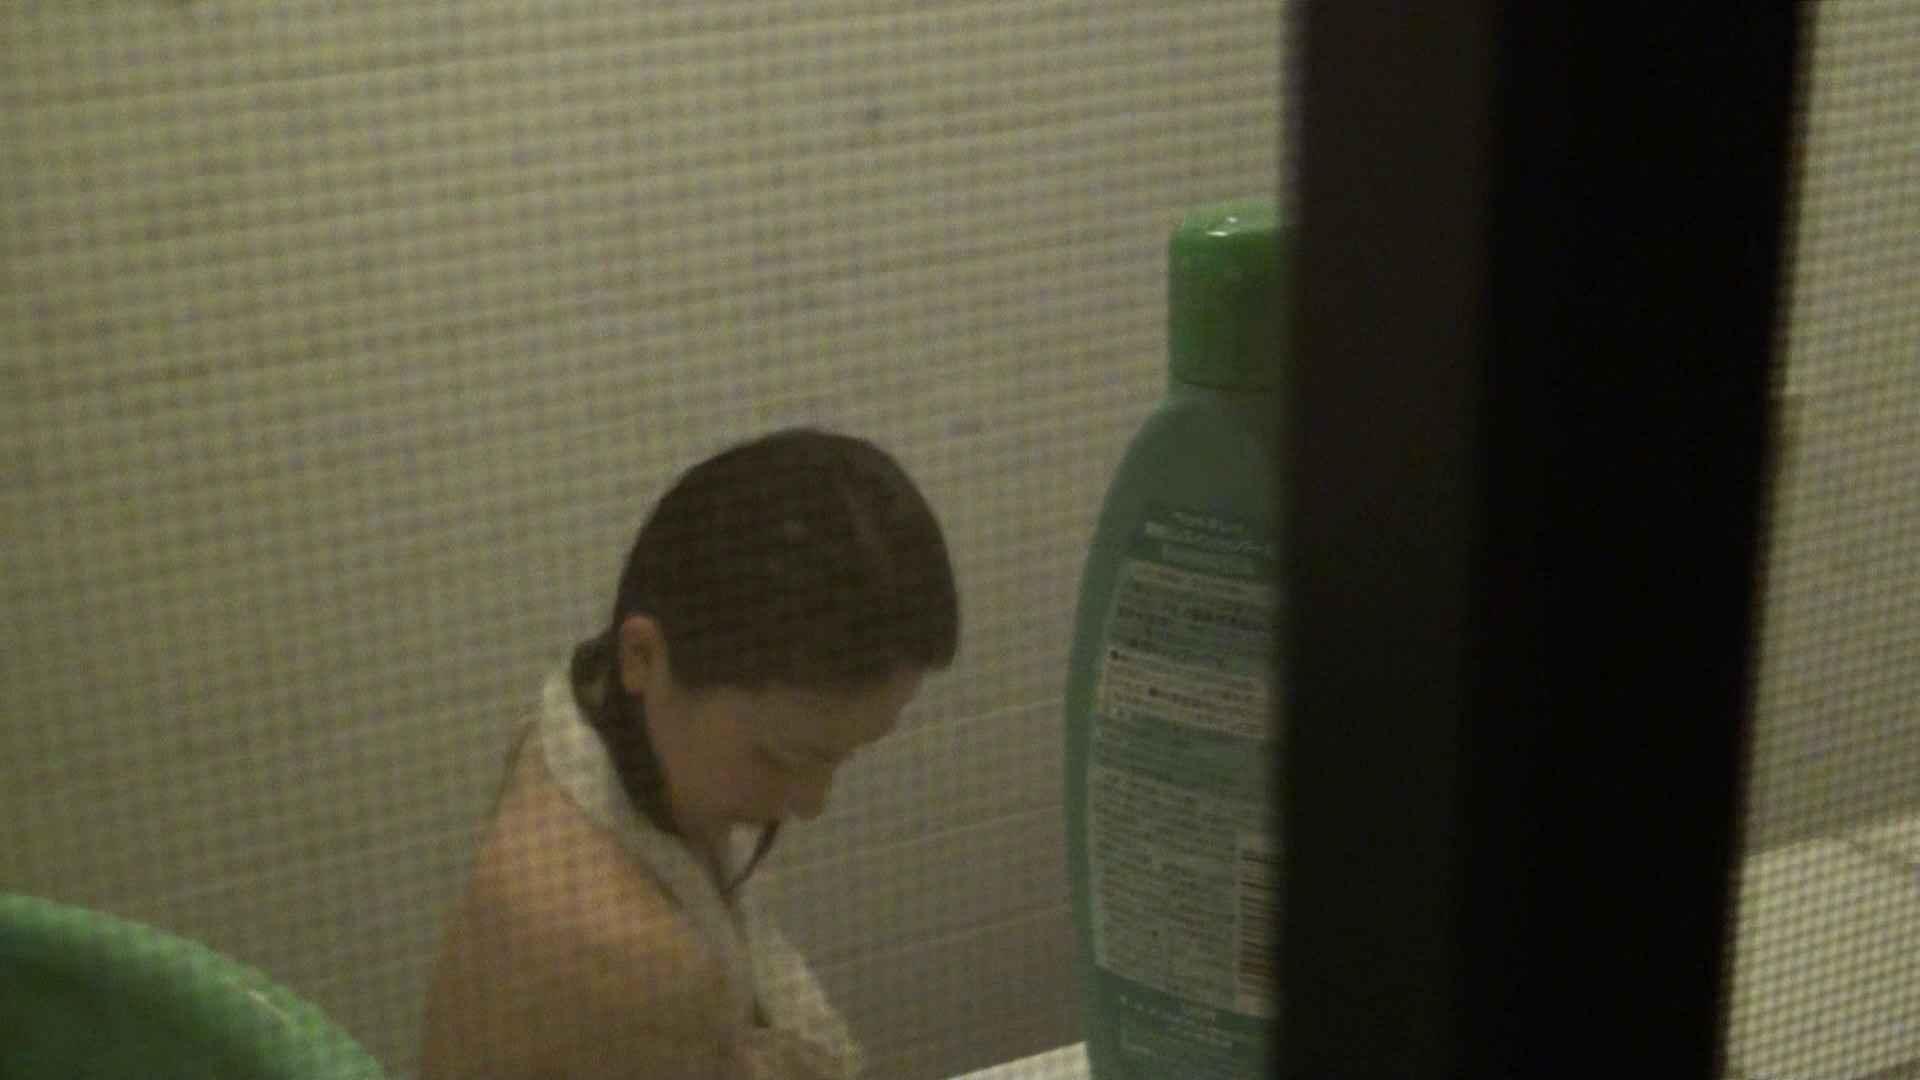 vol.06顔を洗い流す極上お女市さんの裸体をハイビジョンで!風呂上り着替え必見! 美人編 戯れ無修正画像 68画像 6